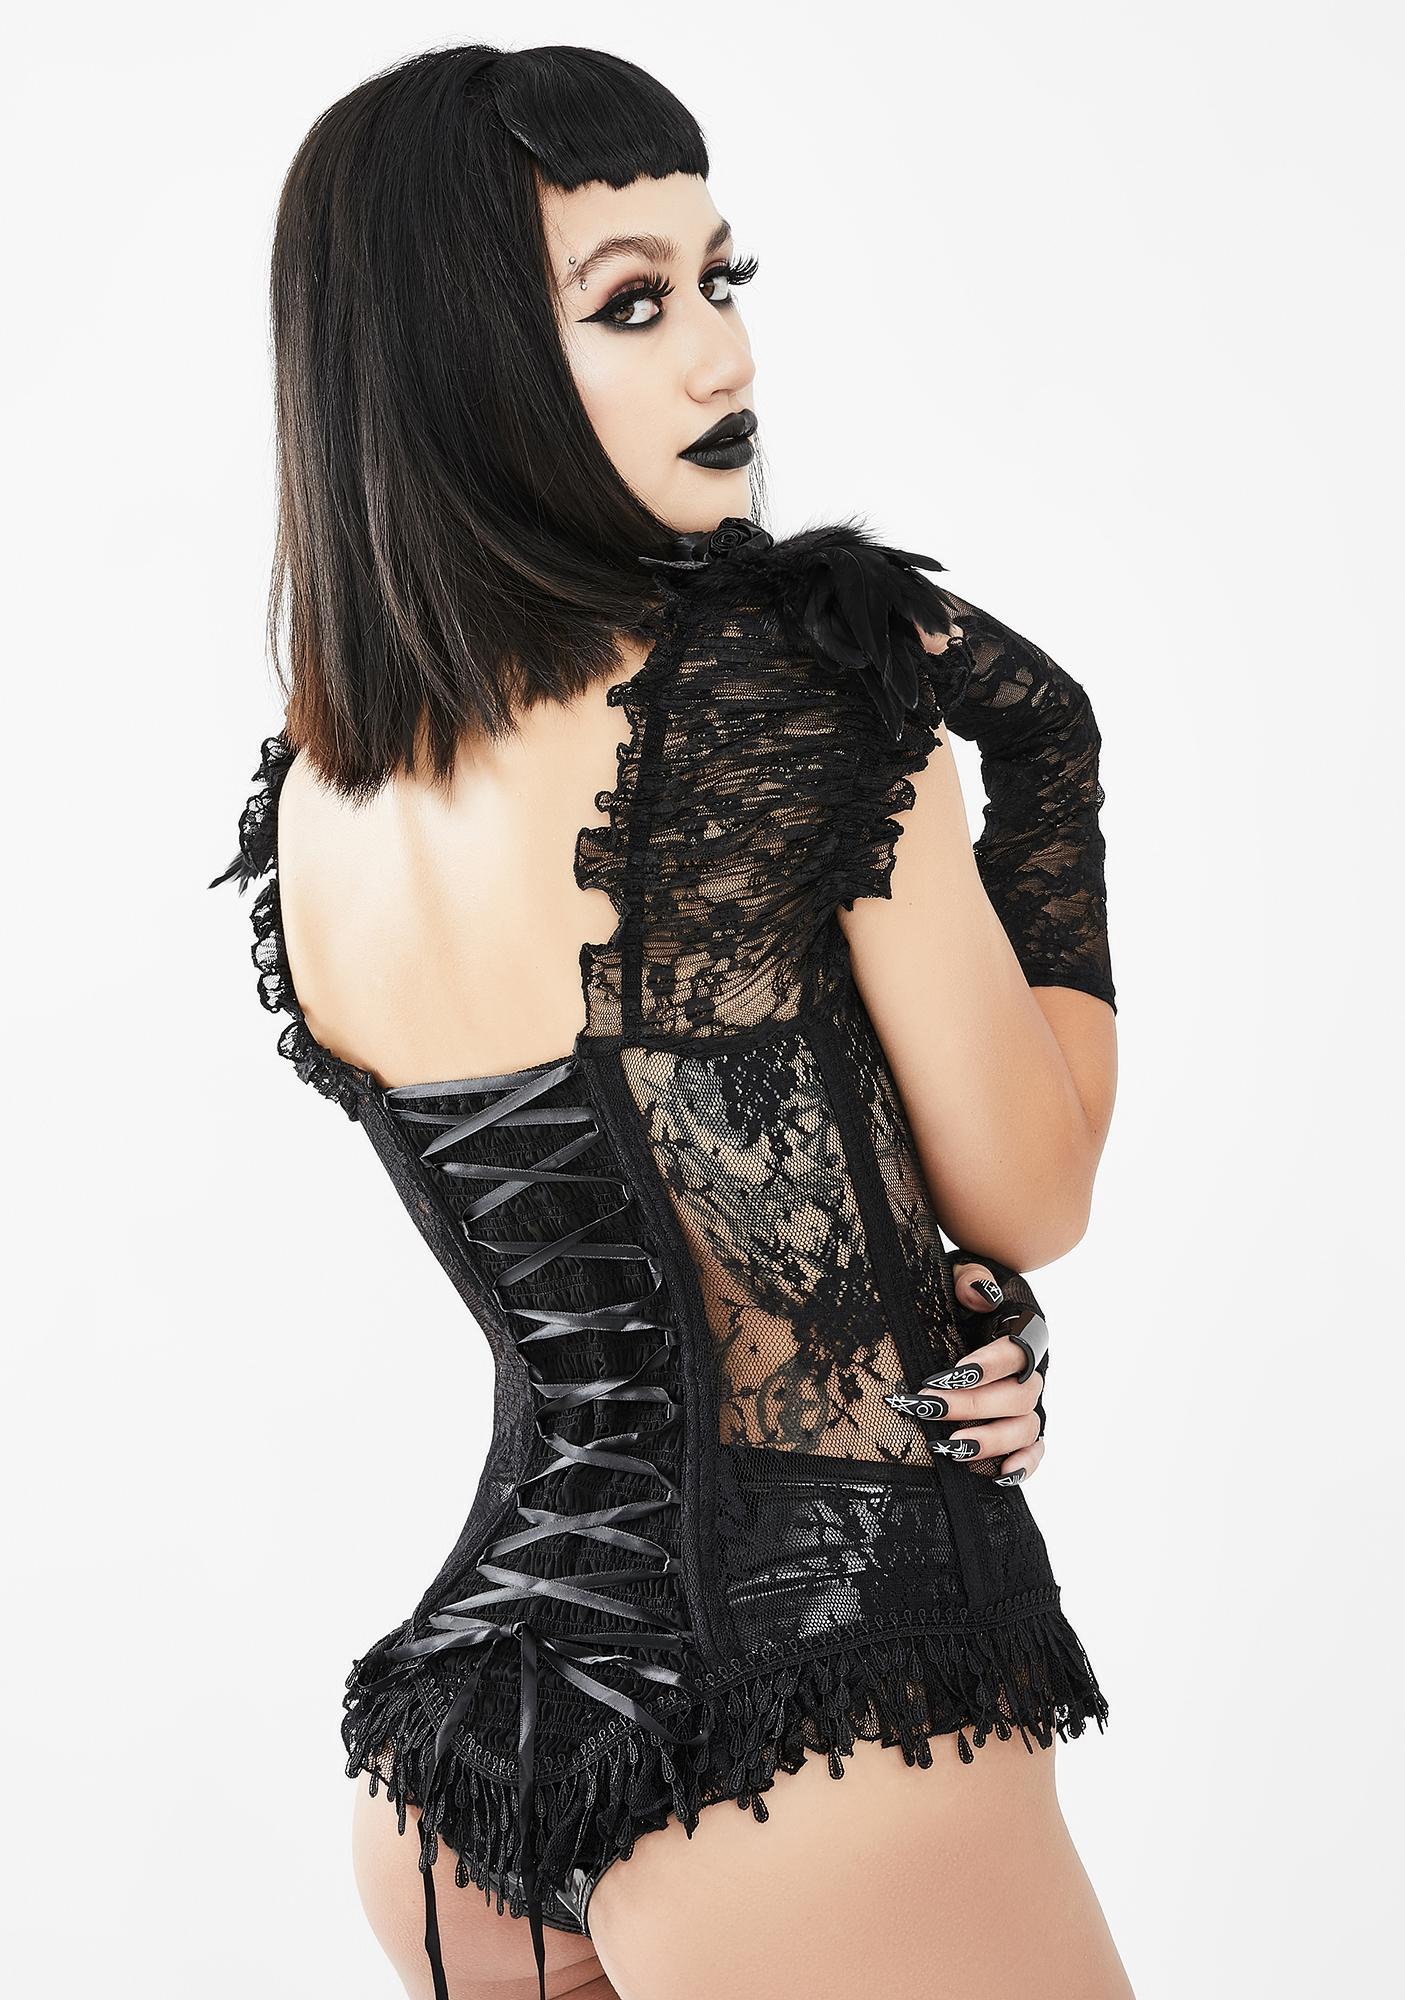 Eva Lady Frilly Lace Button Up Blouse